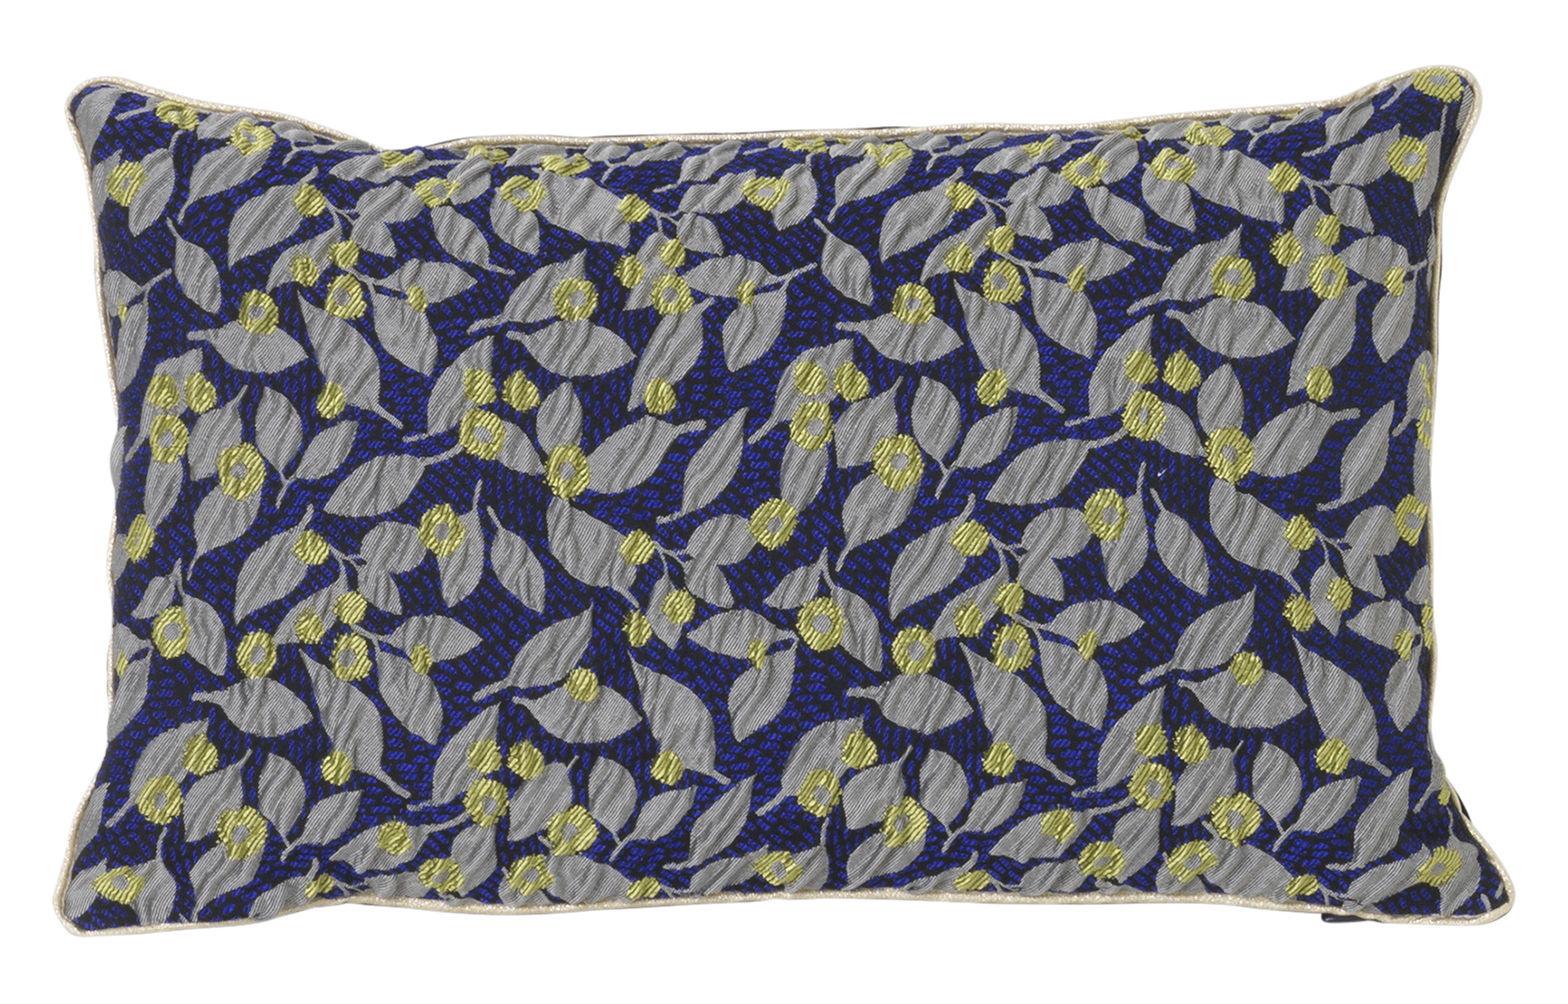 Interni - Cuscini  - Cuscino Salon - Flower - / 40 x 25 cm di Ferm Living - Blu - Mélange de fibres, Plumes, Velluto